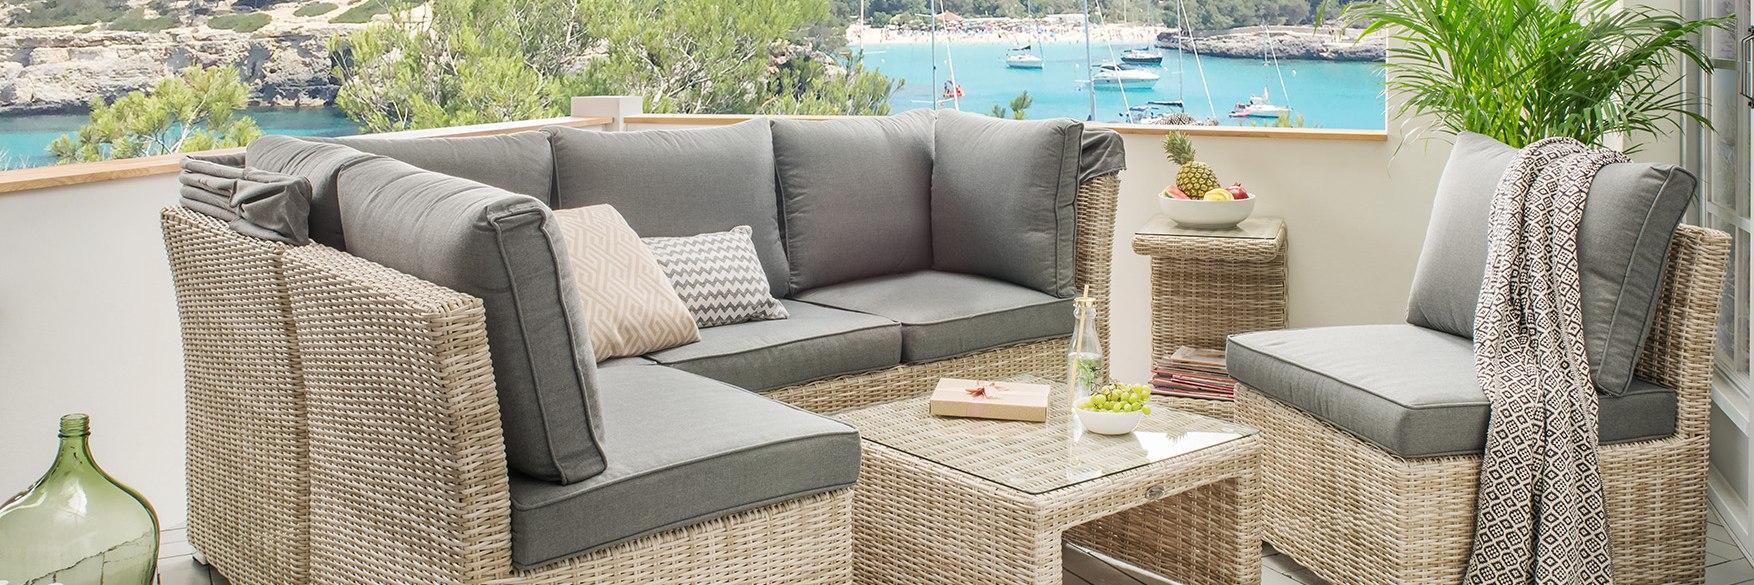 ARUBA Lounge Set mit Kissen